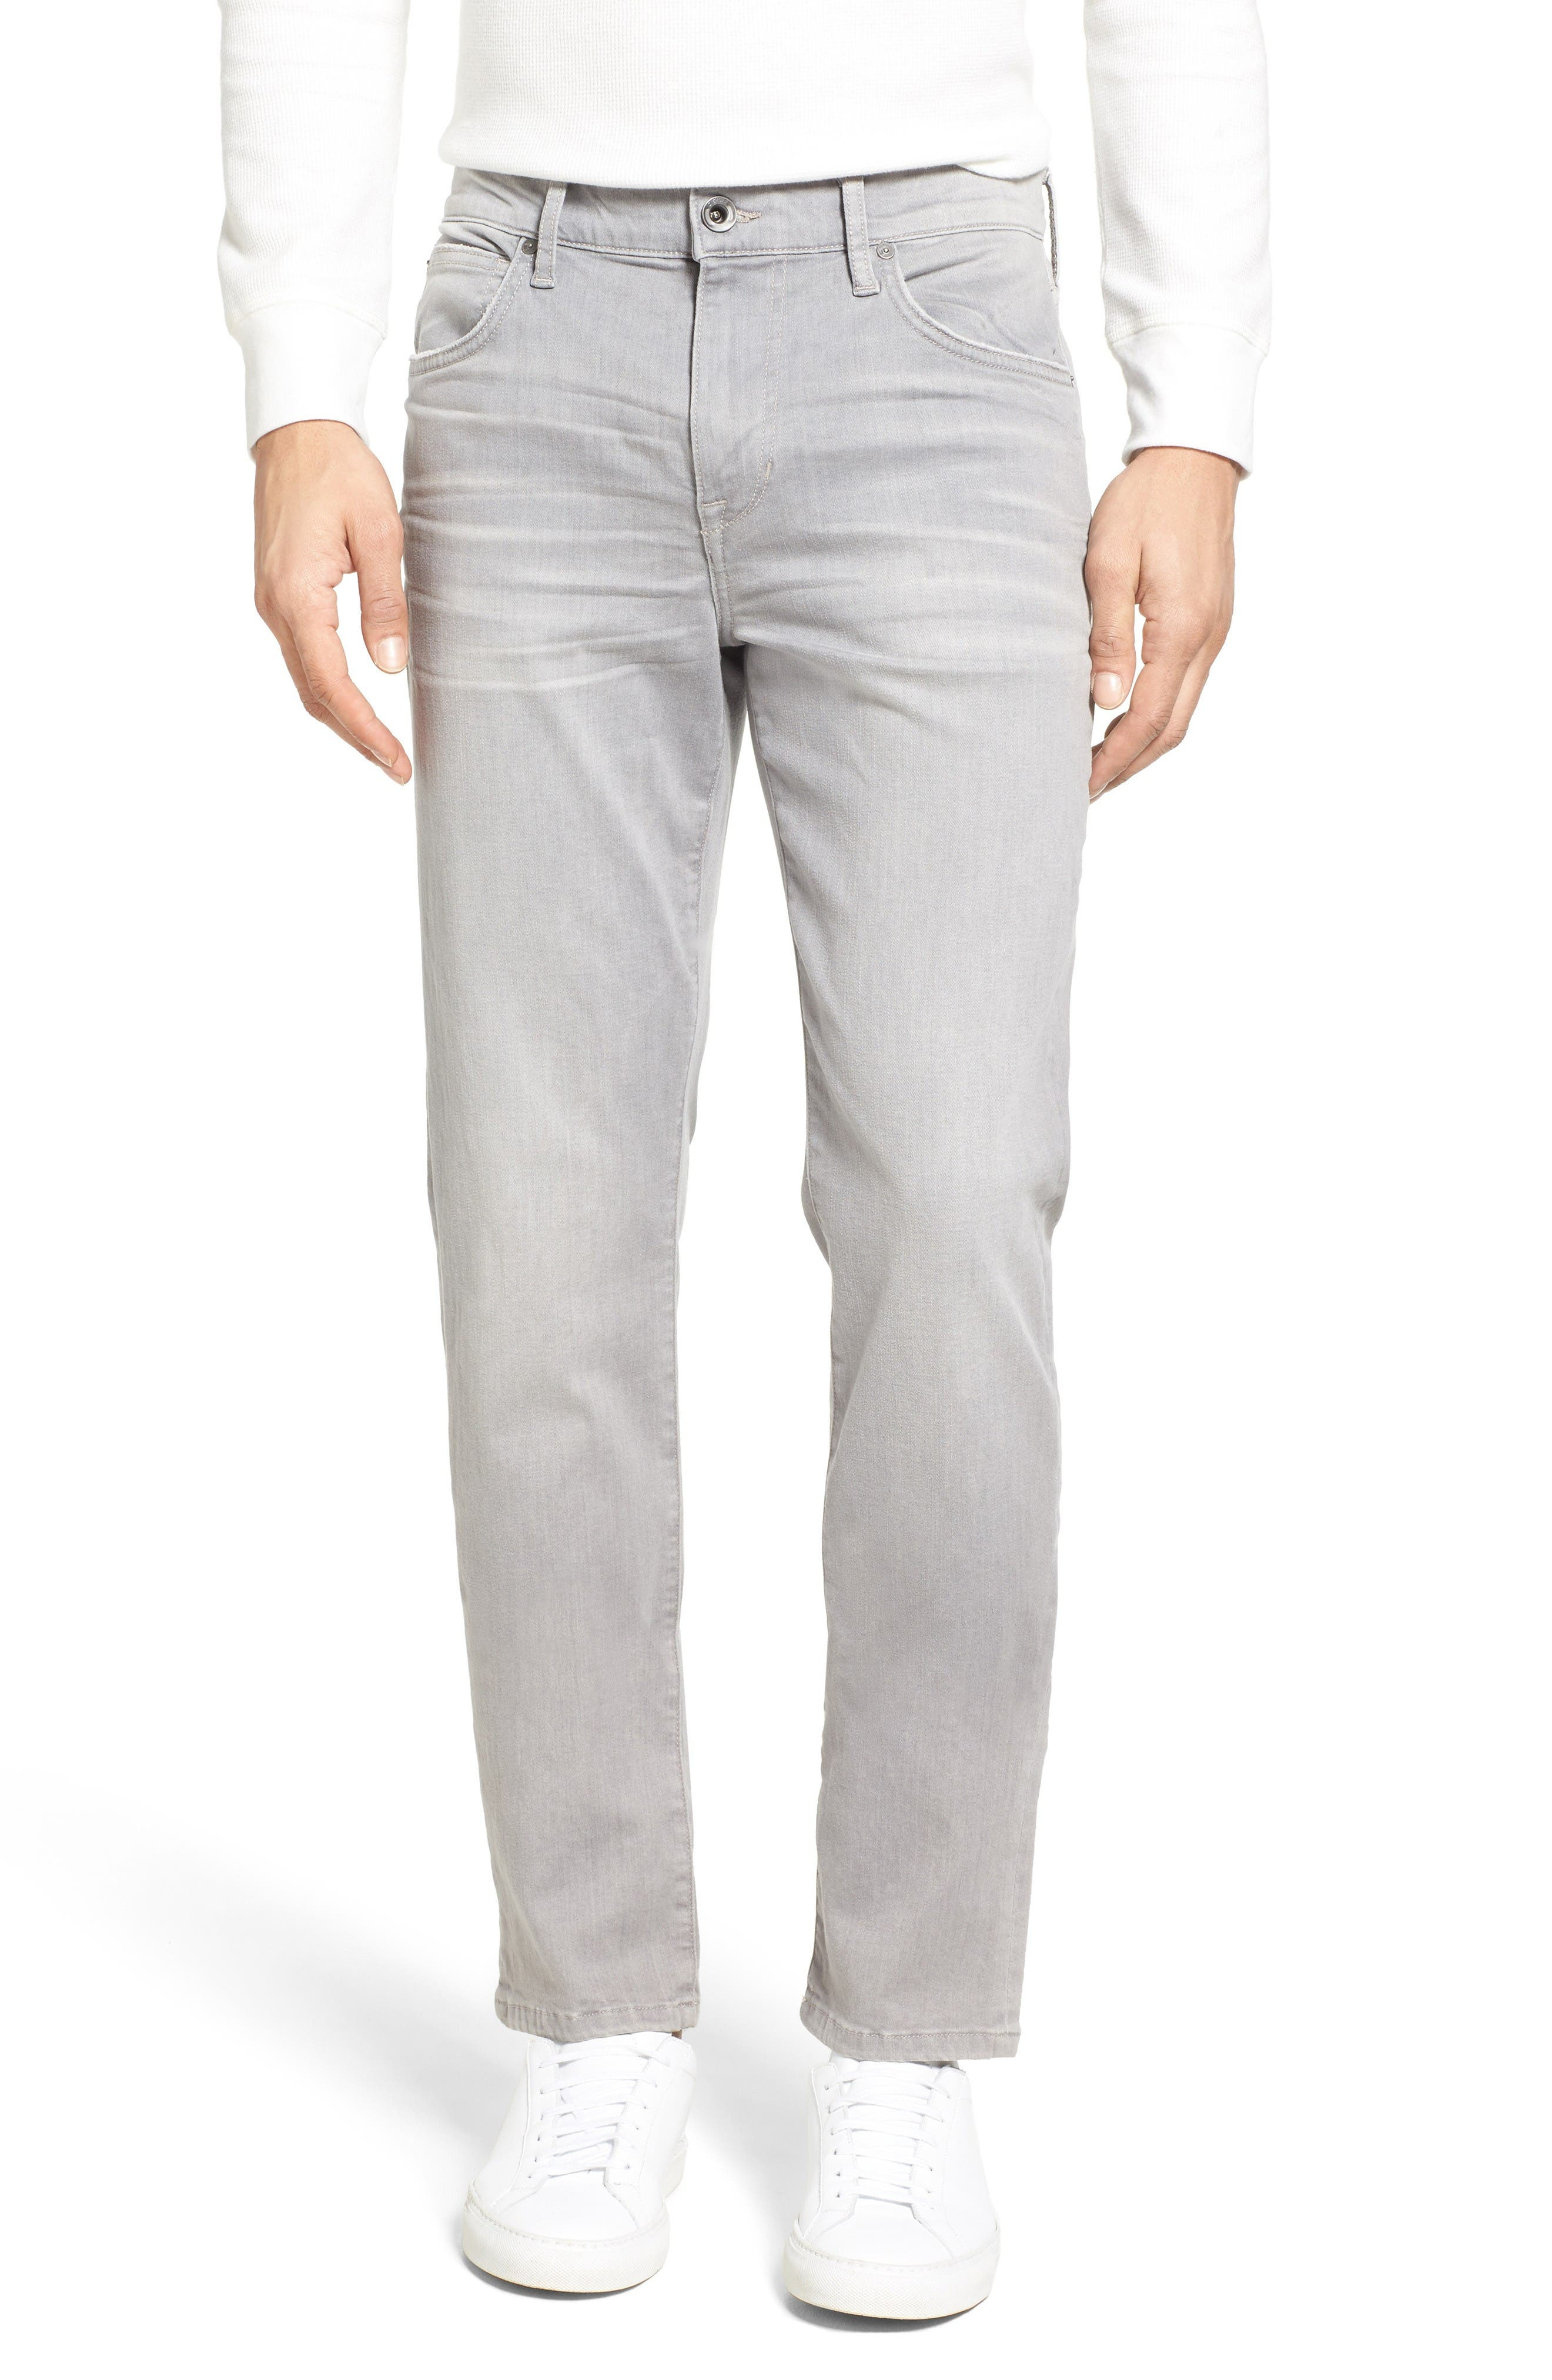 Main Image - Joe's Slim Fit Jeans (Wolfe)